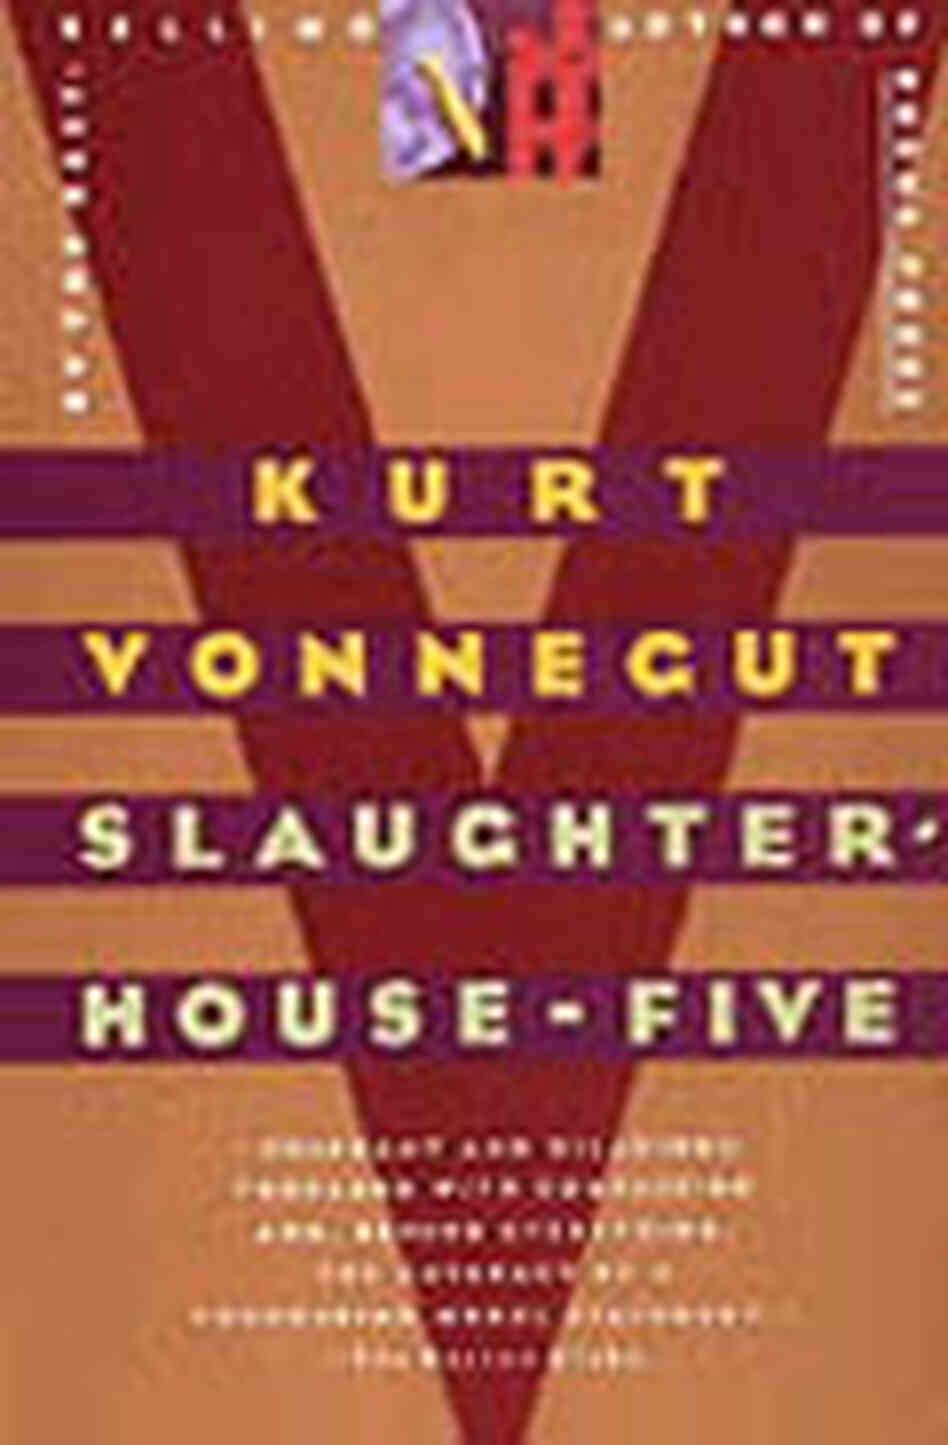 slaughterhouse five by kurt vonnegut essay